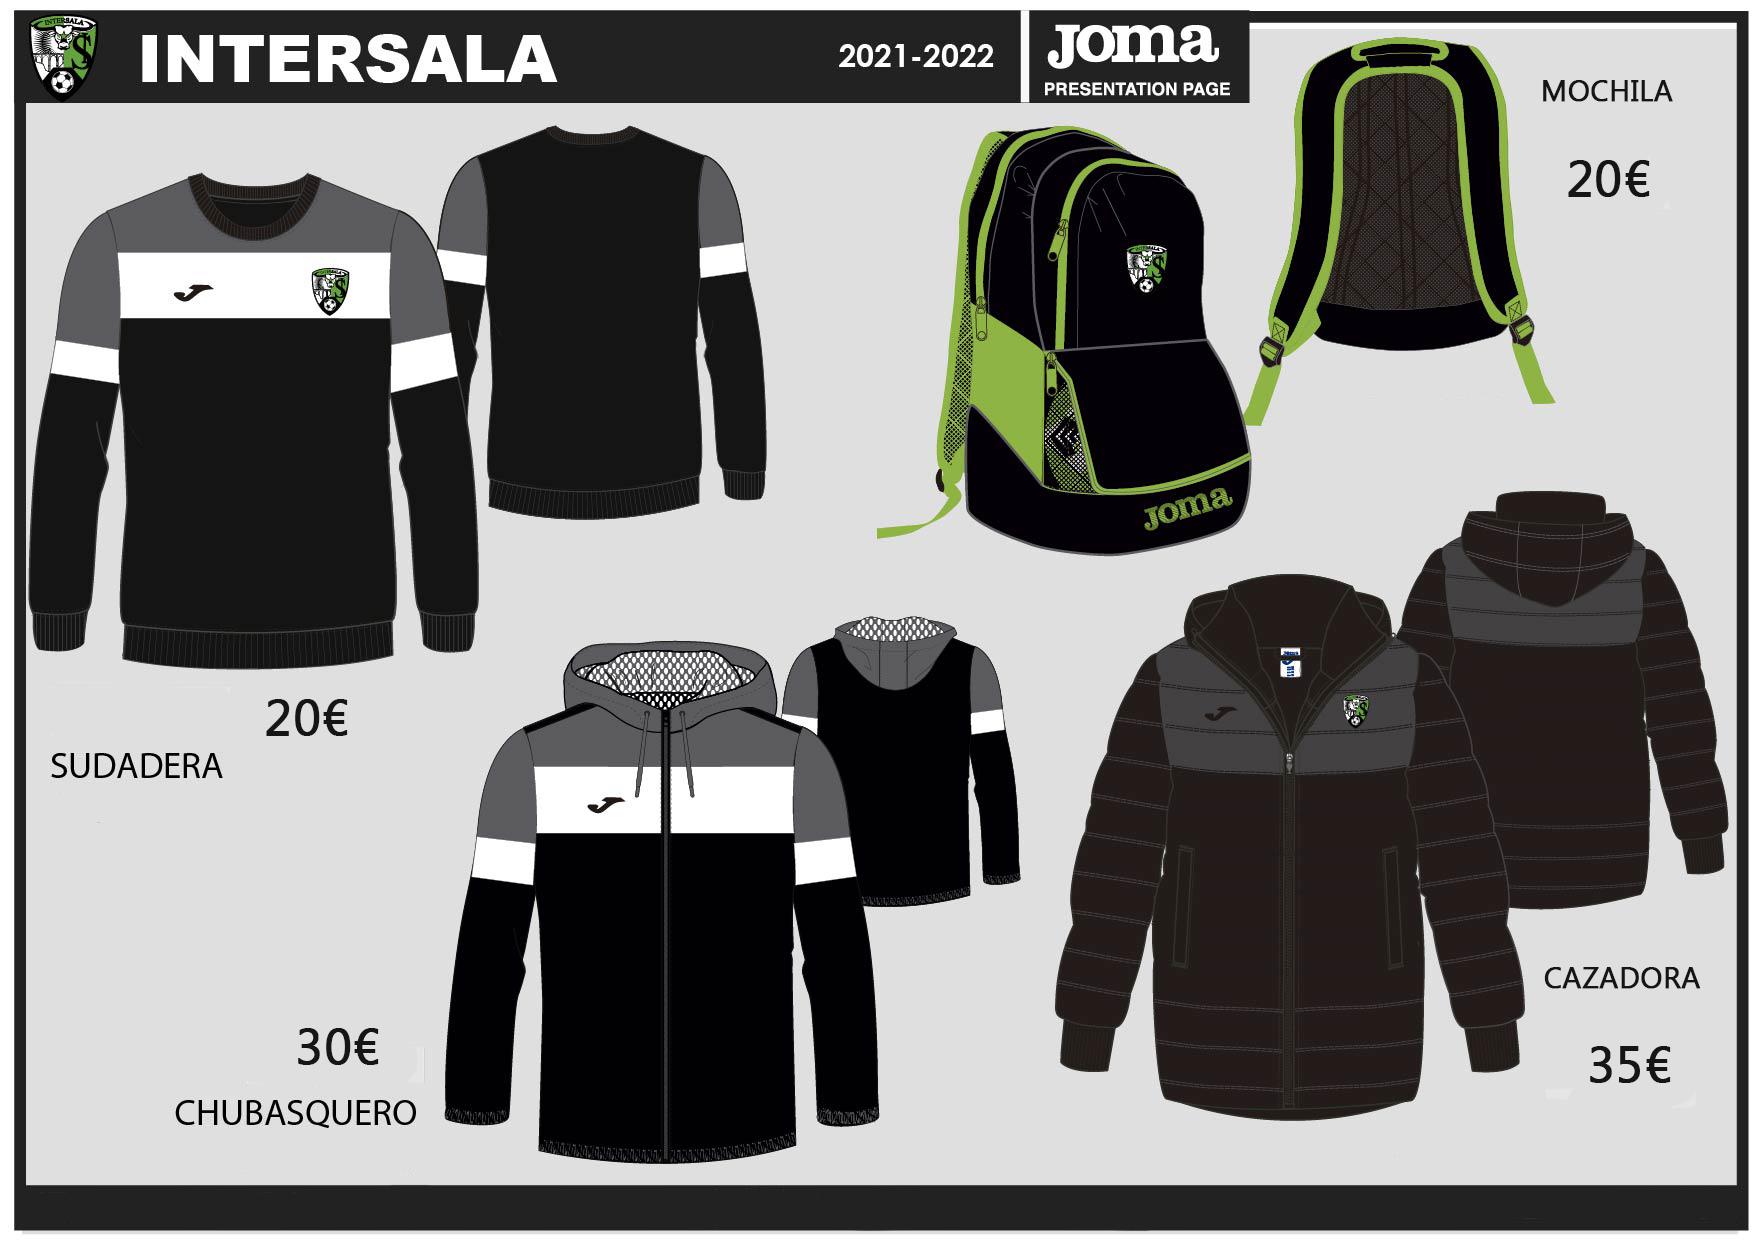 Club deportivo InterSala | www.intersala.es